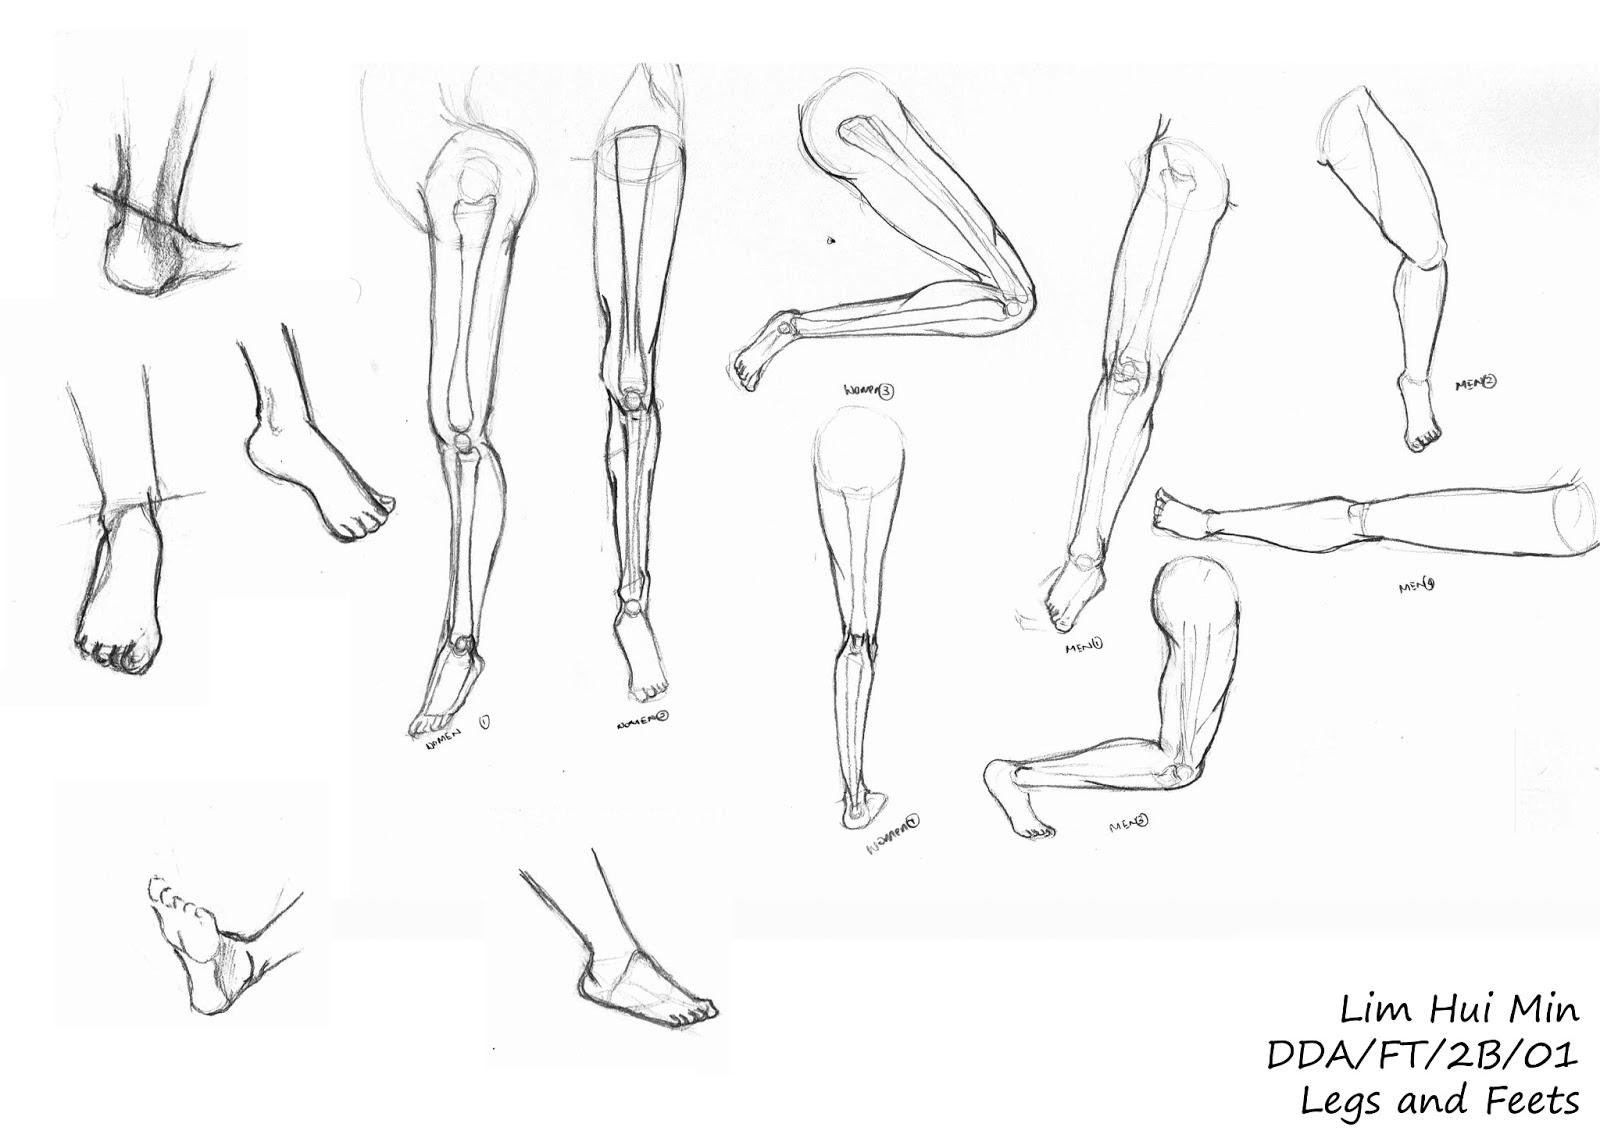 Drawn legs And Feet Lim Feet Min